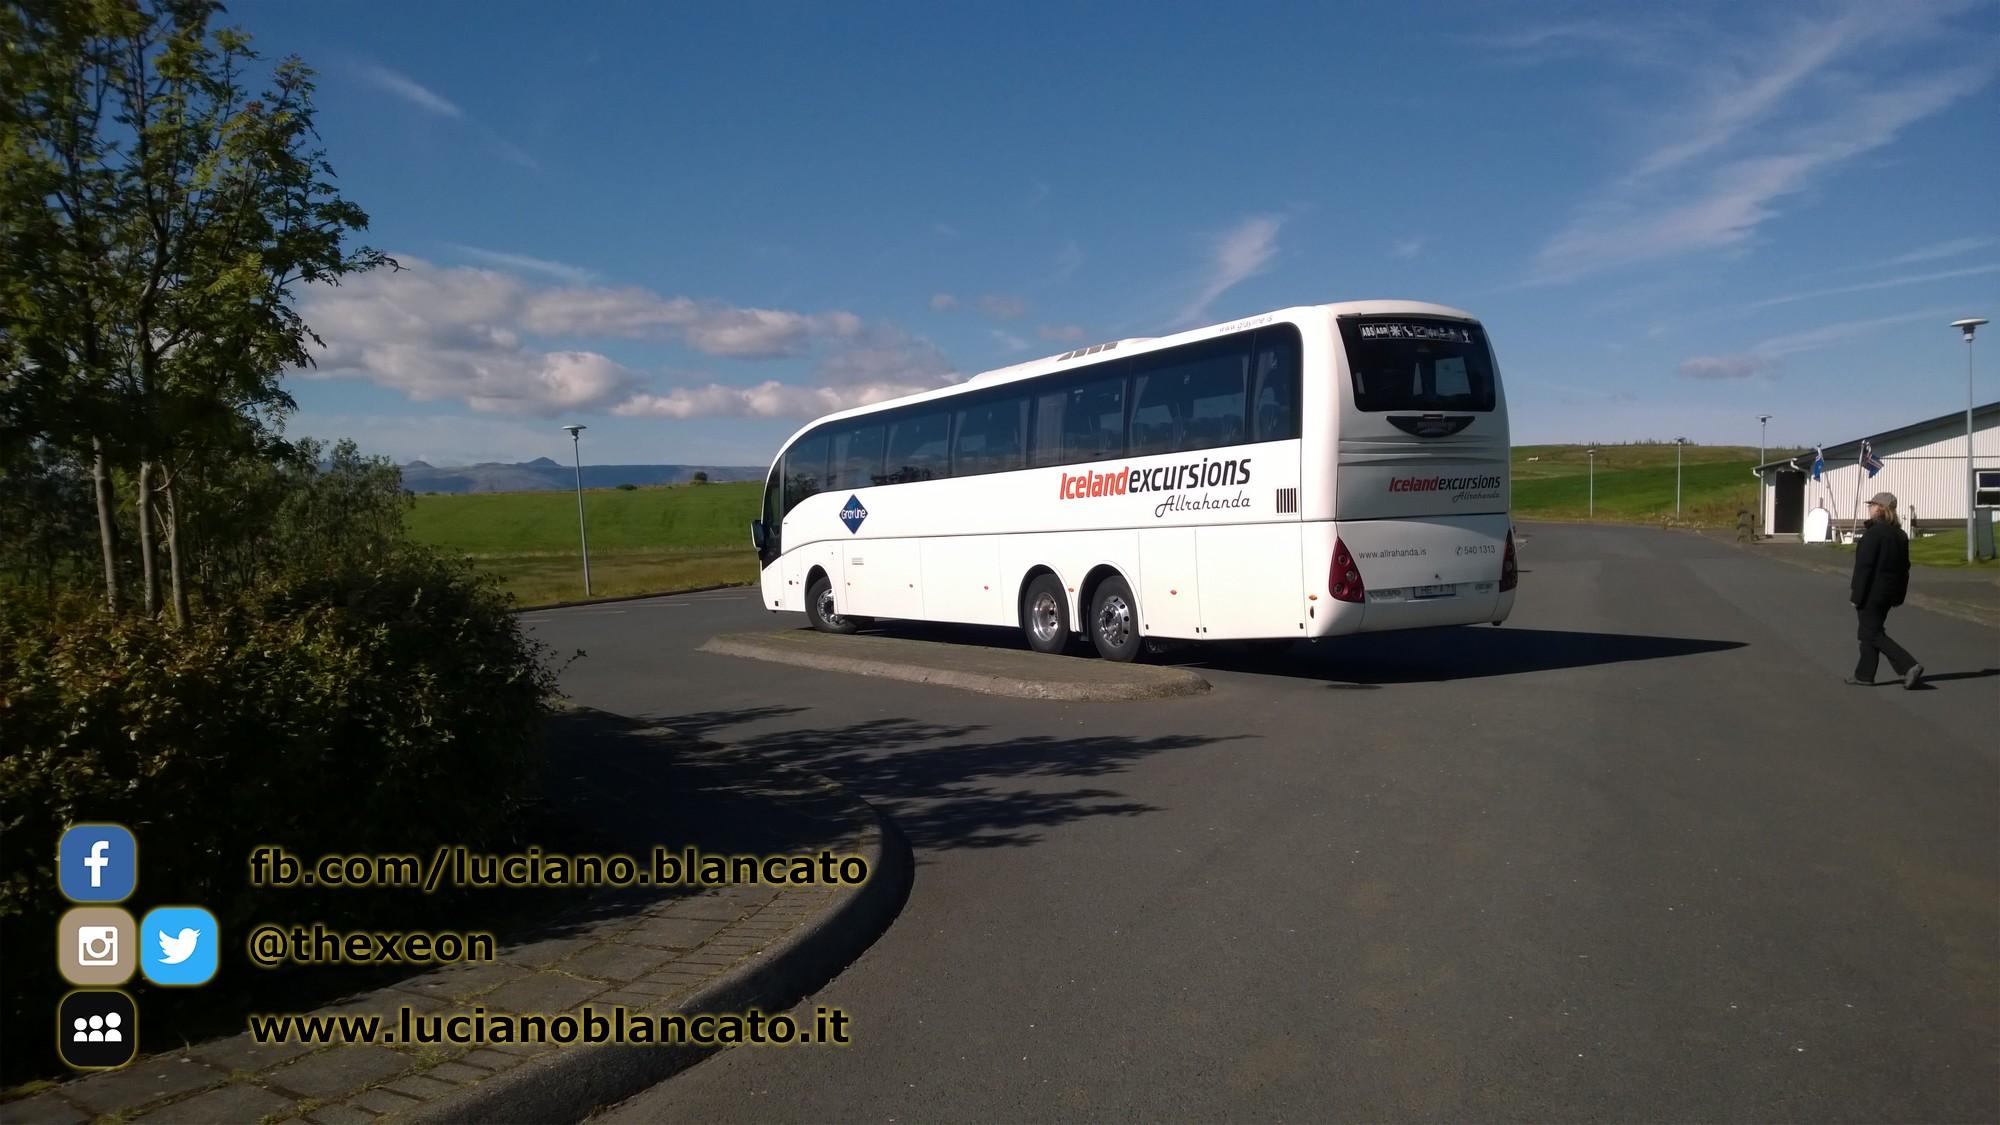 Iceland - IcelandExcursions bus!